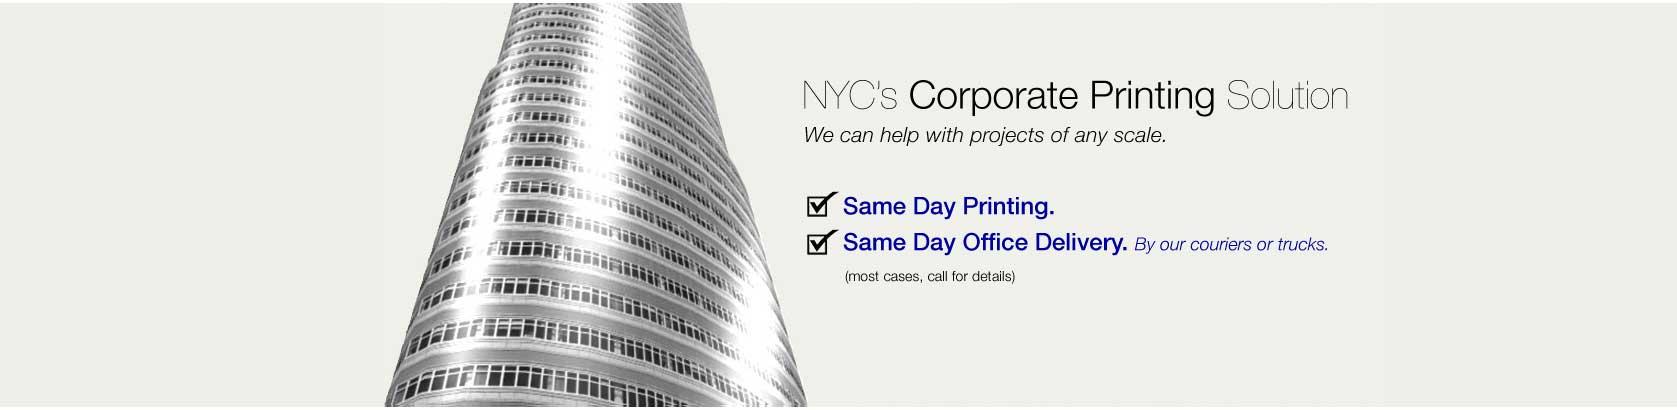 Home copyroom corporate digital printing services midtown corporate digital printing services manhattan ny malvernweather Gallery